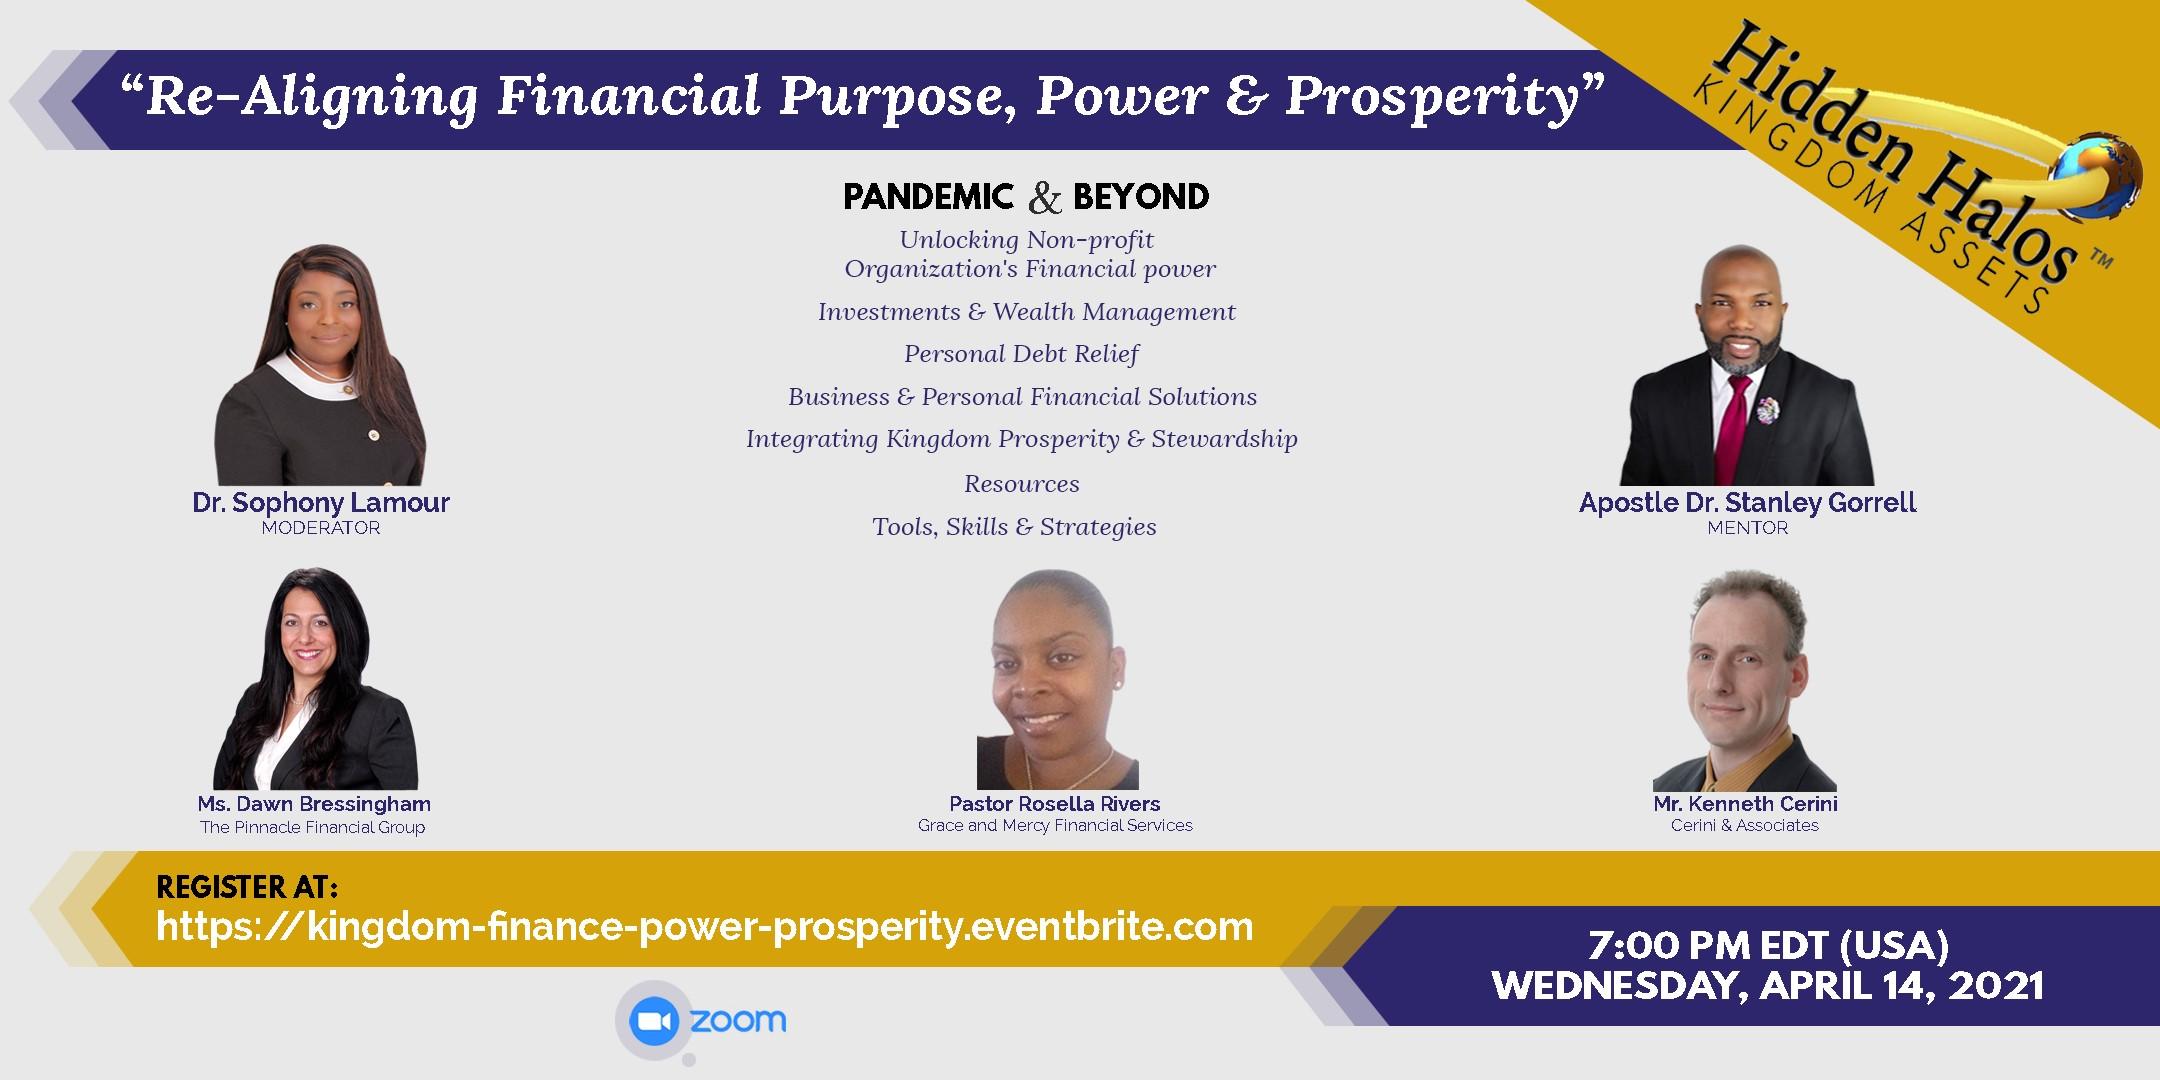 Unveiling Financial Purpose, Power & Prosperity: Pandemic & Beyond